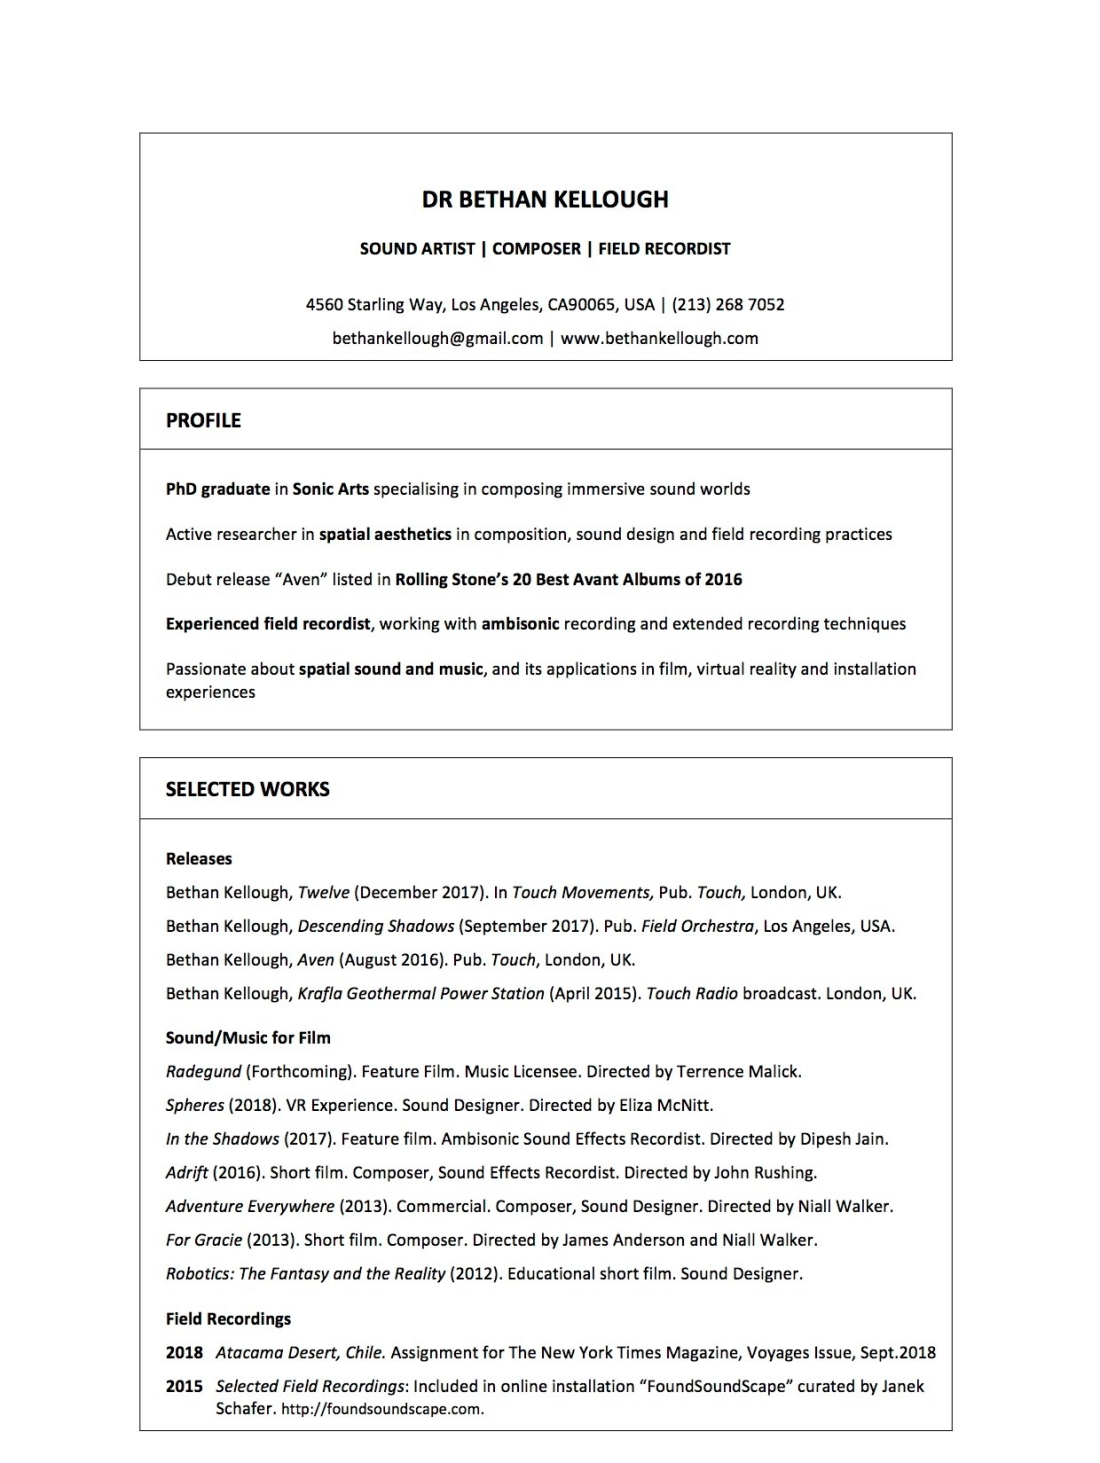 curriculum-vitae_dr-bethan-kellough_sept2018.jpg